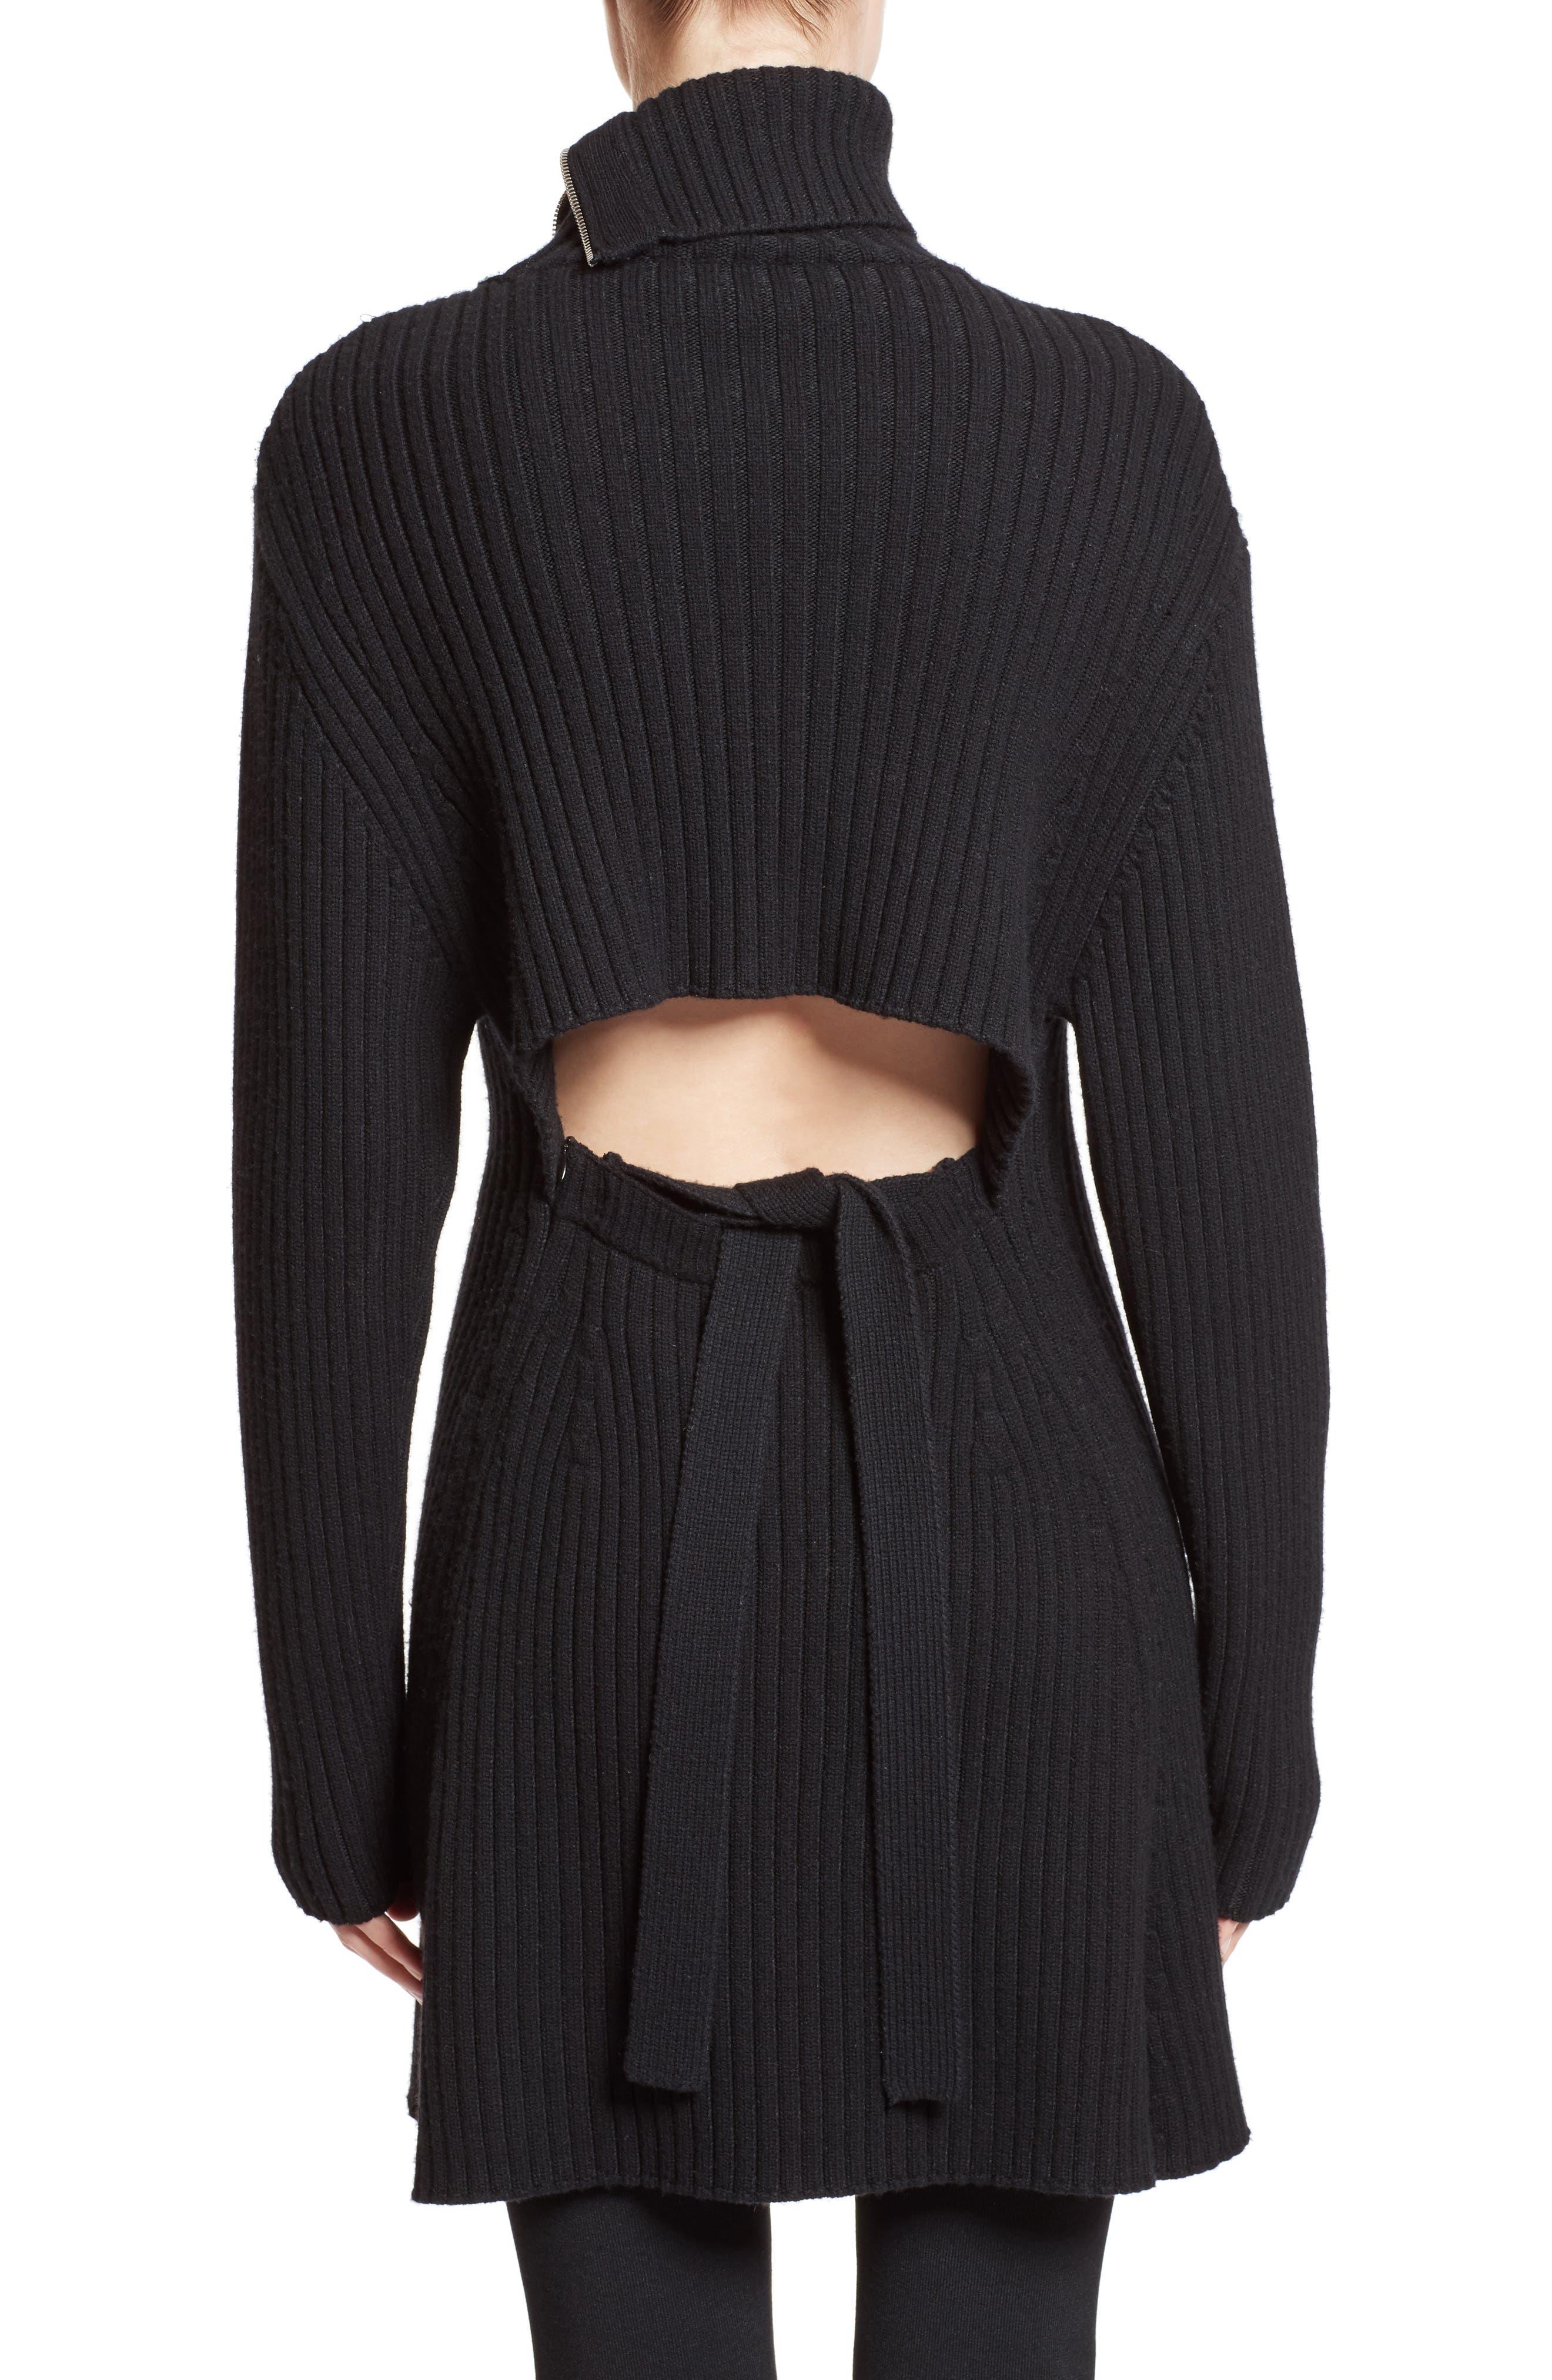 Wool & Cashmere Blend Turtleneck Dress,                             Alternate thumbnail 2, color,                             001